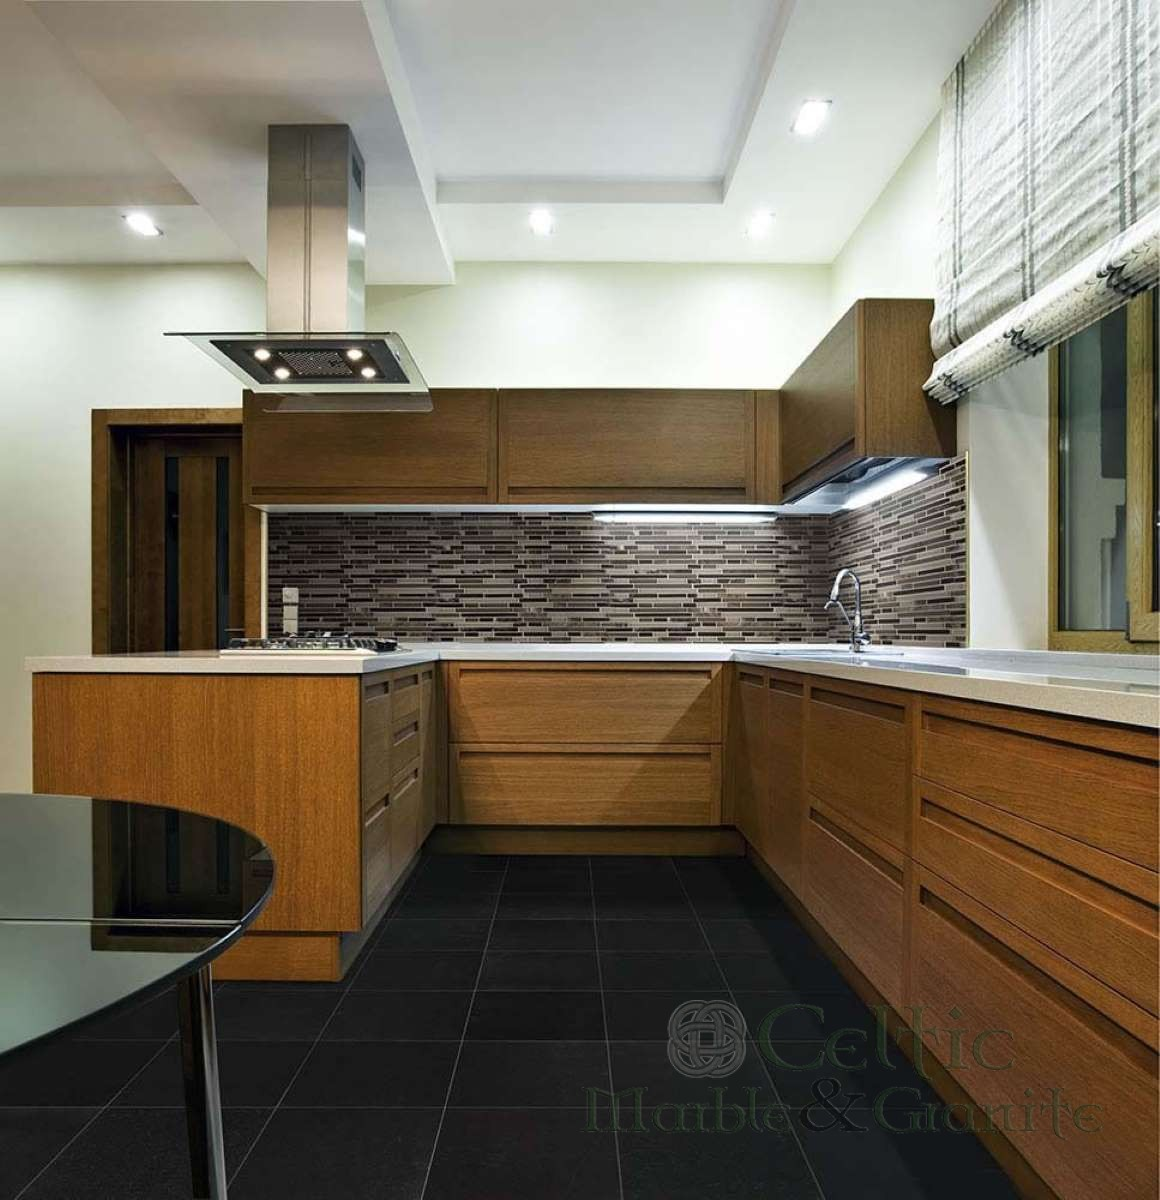 absolute-black-granite_royal-oaks-blend-interlocking-pattern-8mm-a_5